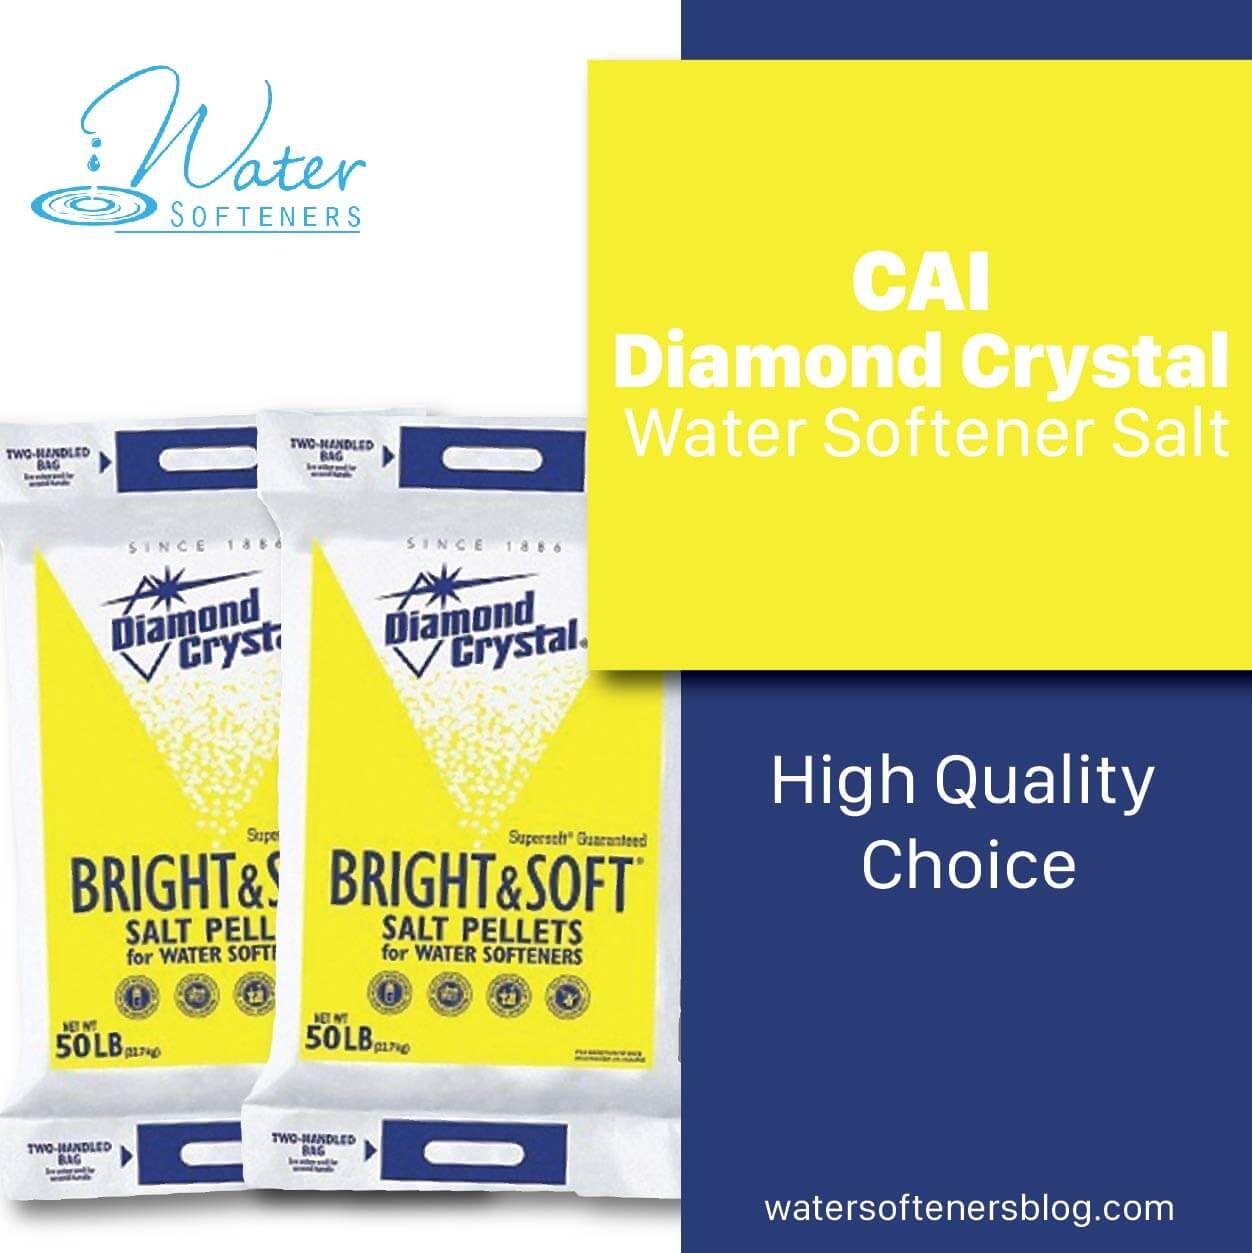 Best Salt For Water Softener In 2020 Water Softener Salt Water Softener Softener